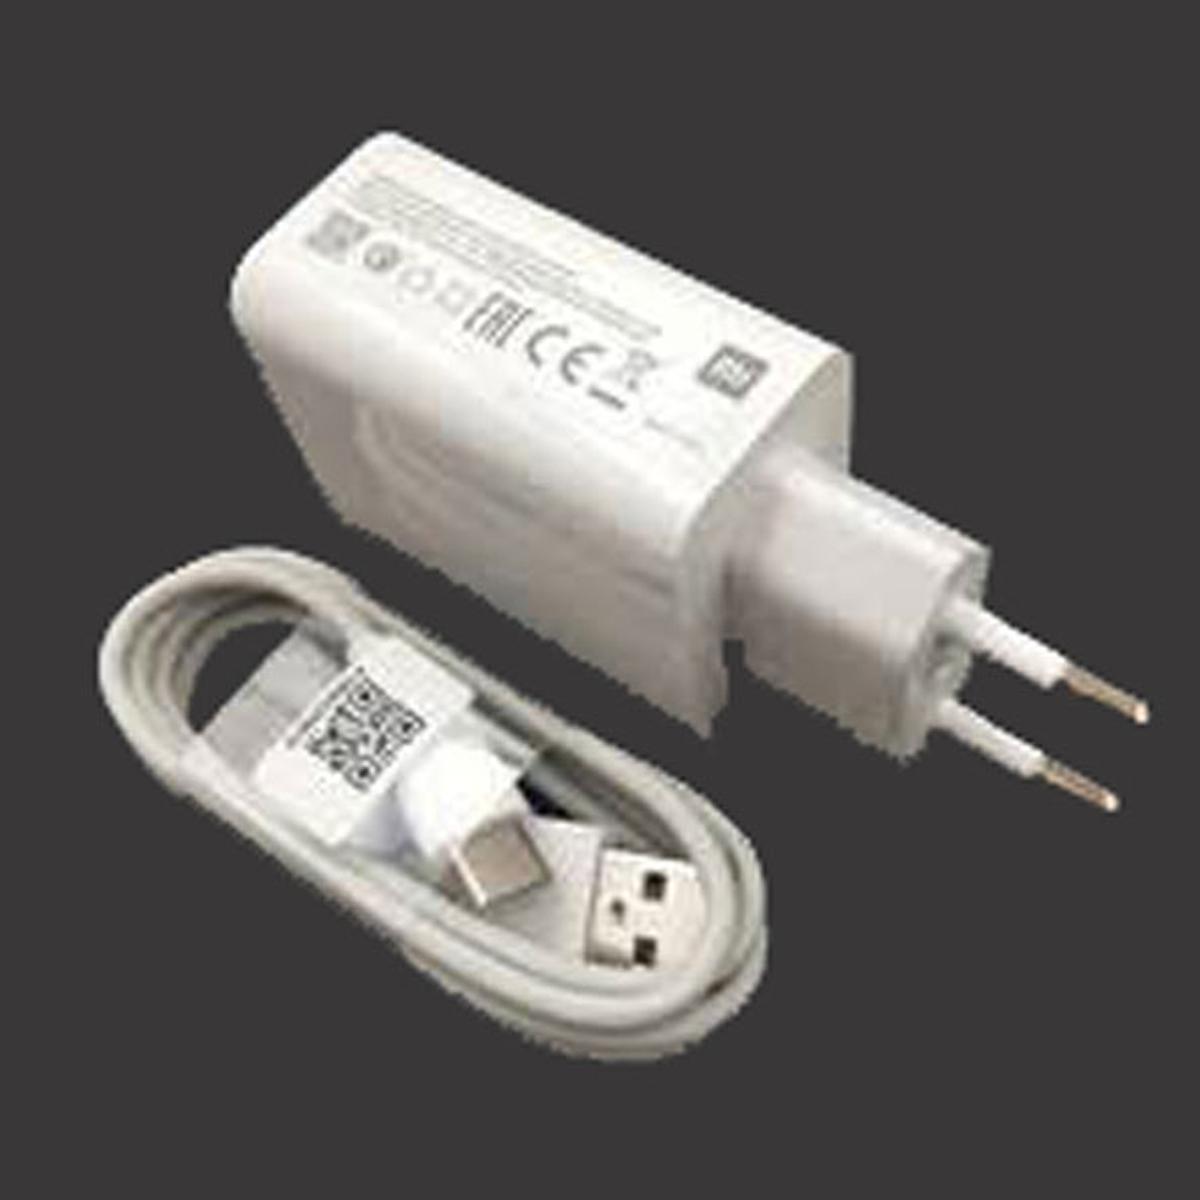 شارژر دیواری مدل MDY-08-EH TYPE-C به همراه کابل تبدیل USB-C                     غیر اصل